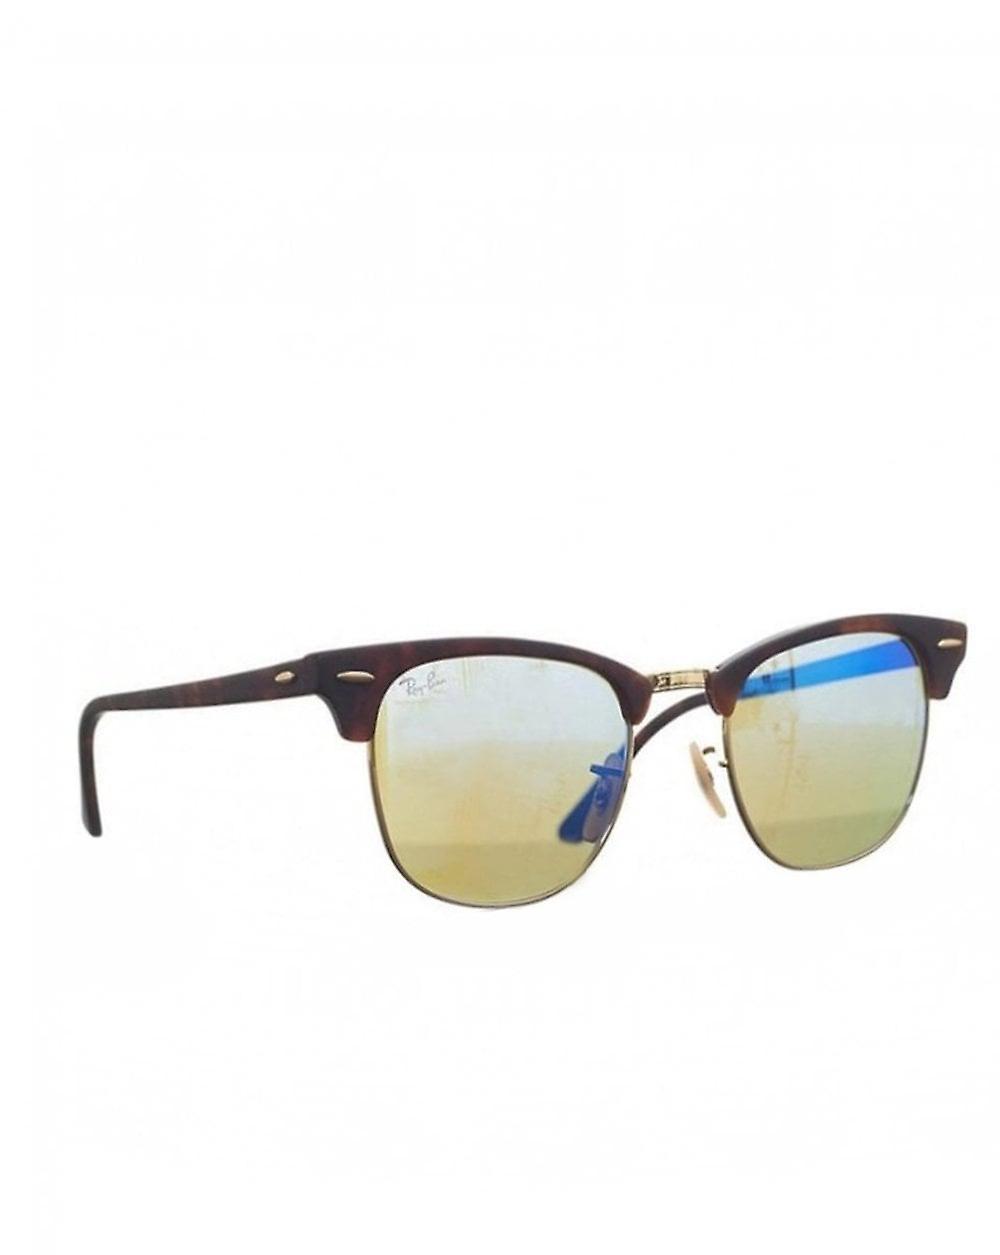 ray ban clubmaster sunglasses usa